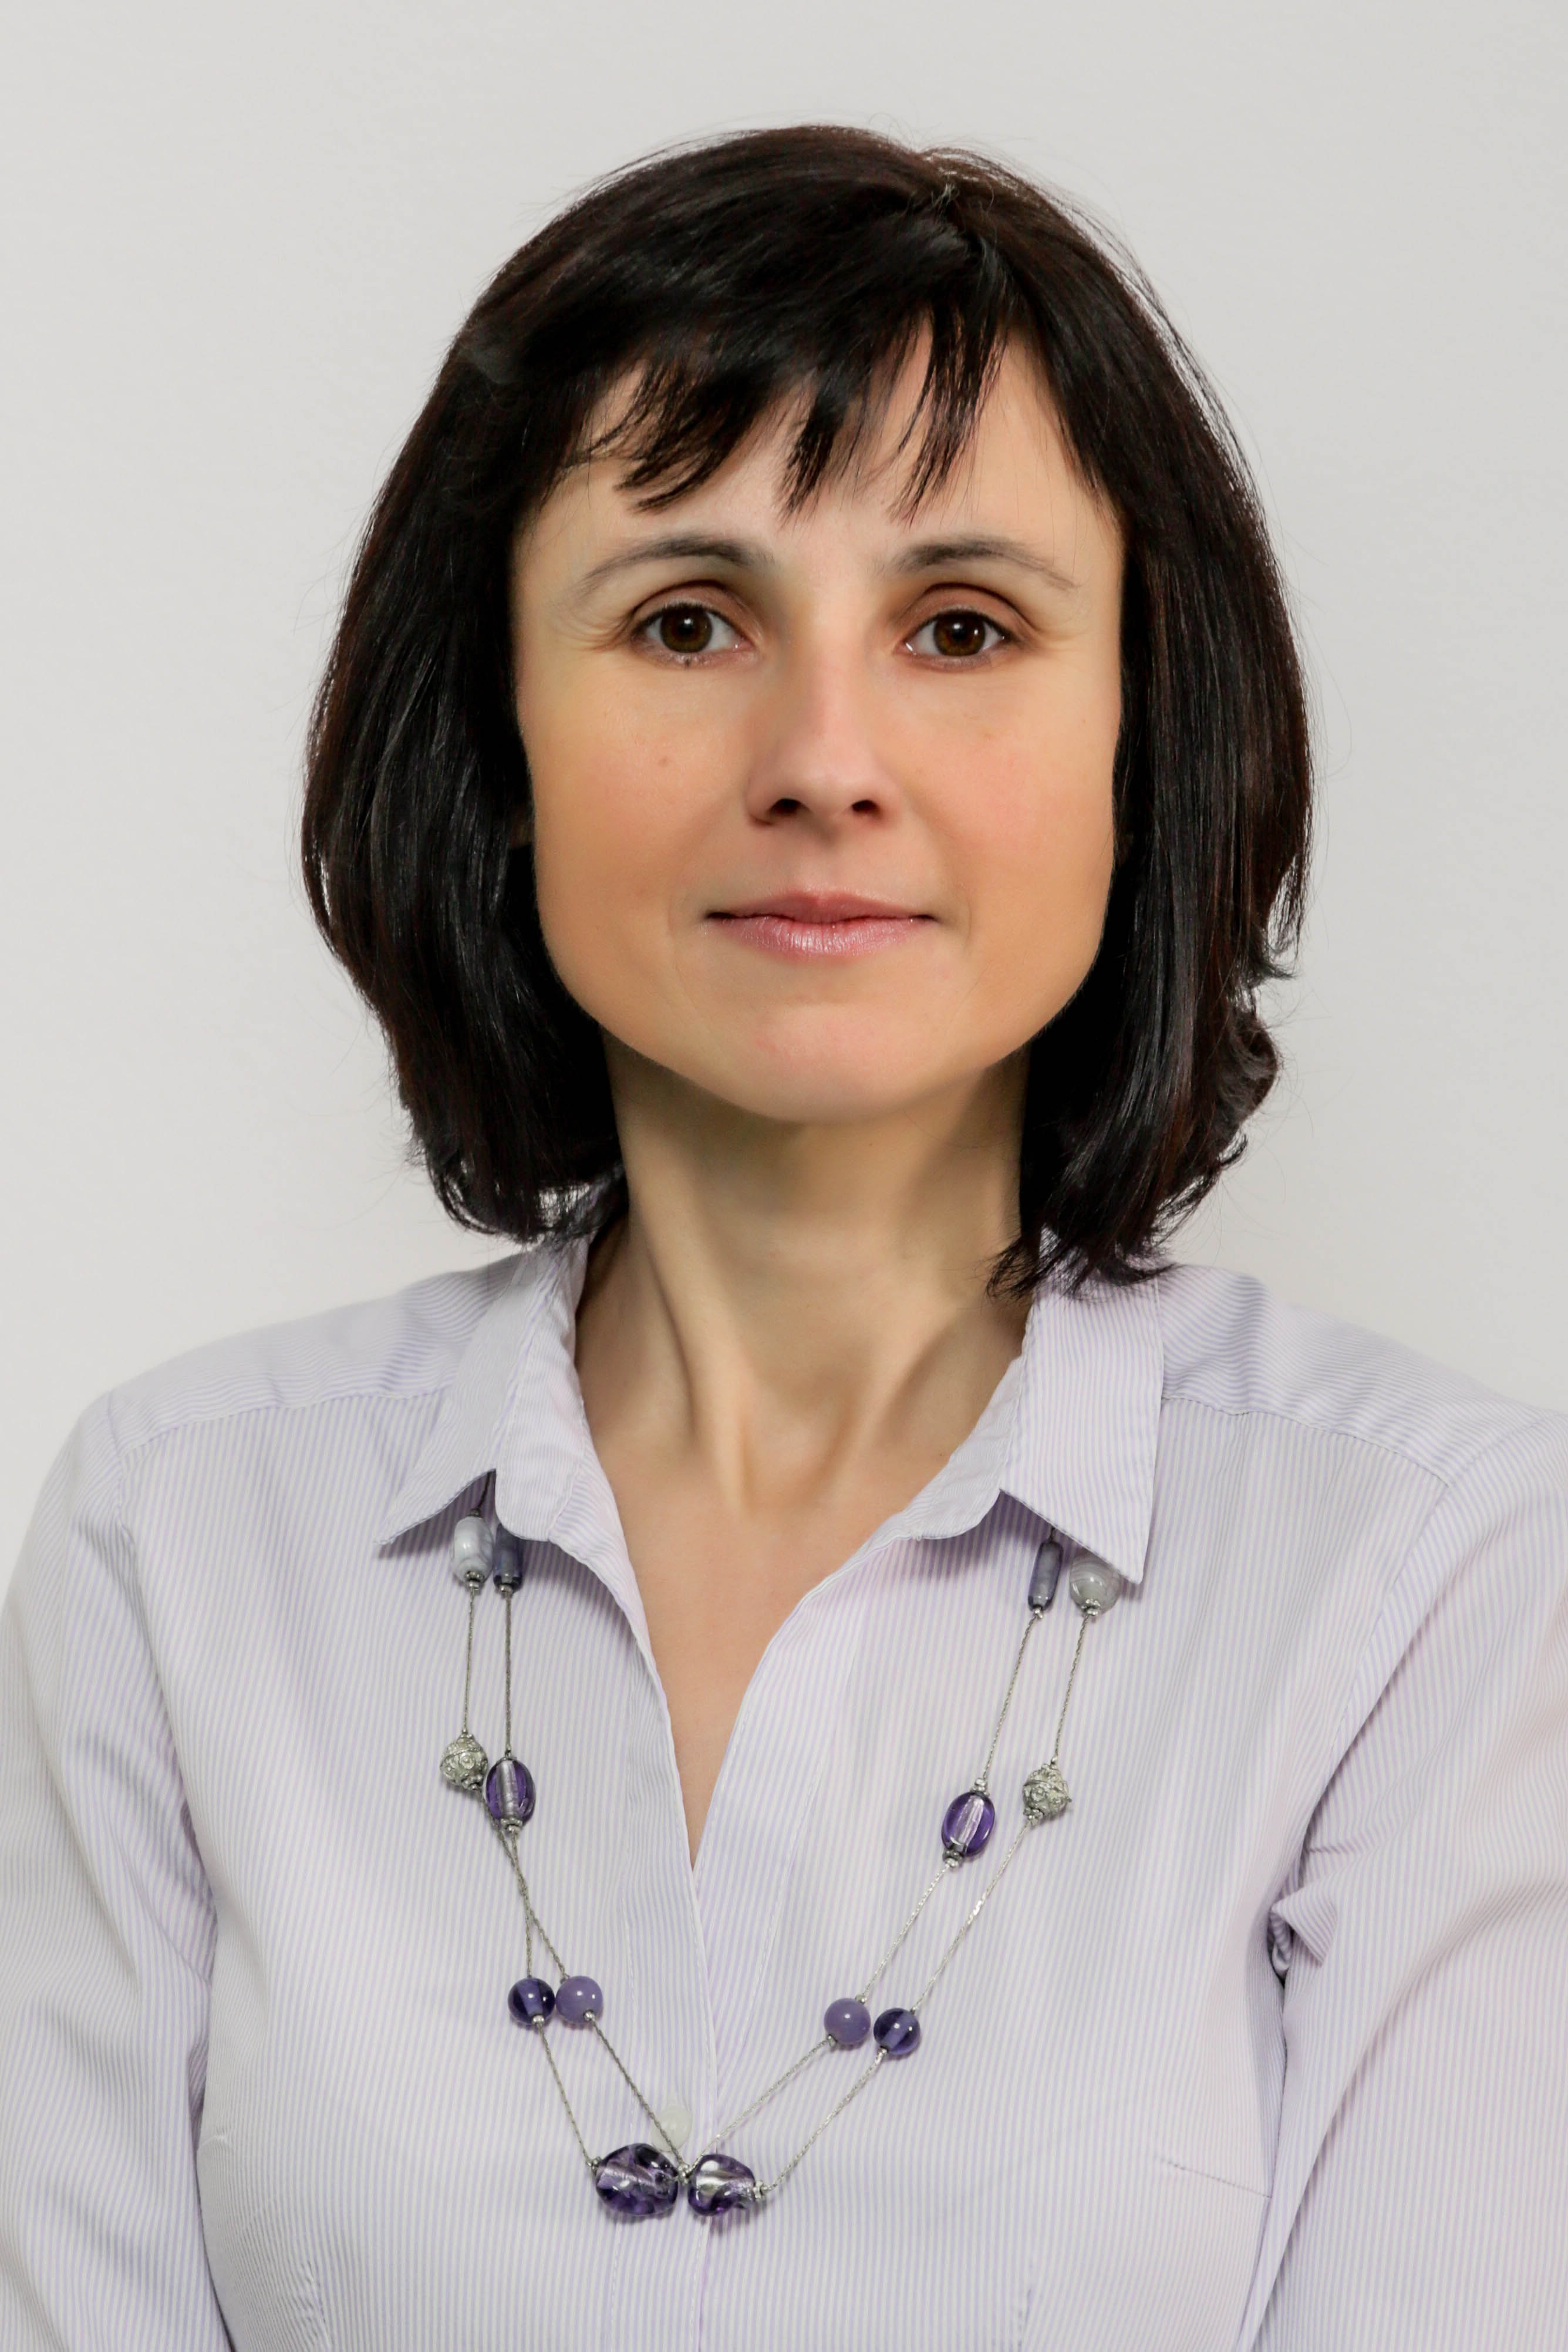 Kadra - mgr Maria Jarocka